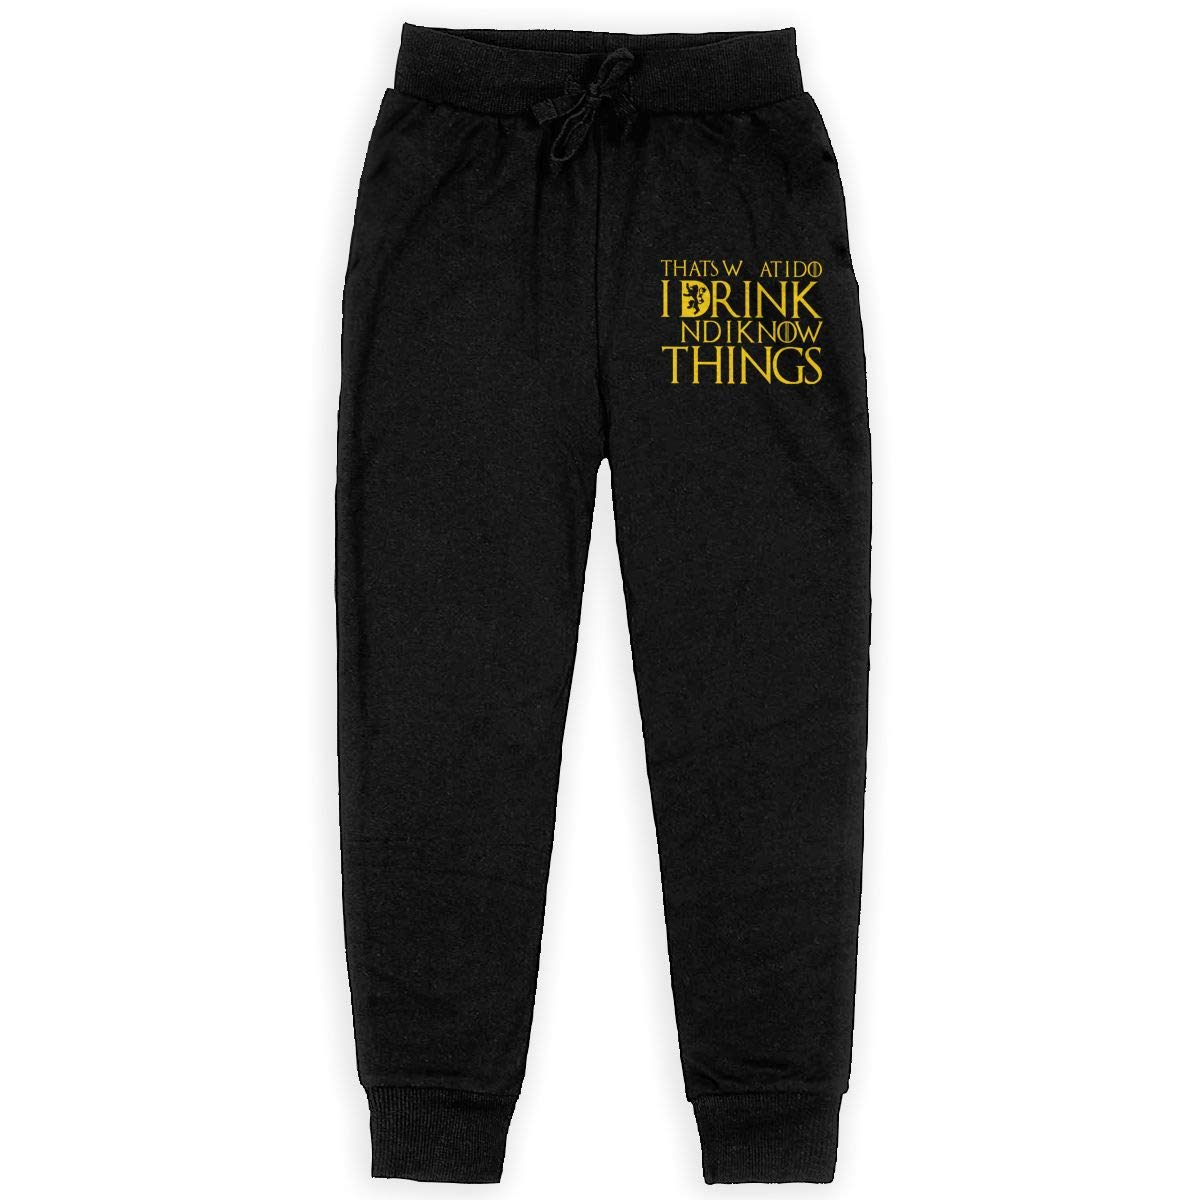 I Googled My Symptoms Turned Out I Just Need Whataburger Big Boys Girls Casual Jogger Soft Training Pants Elastic Waist